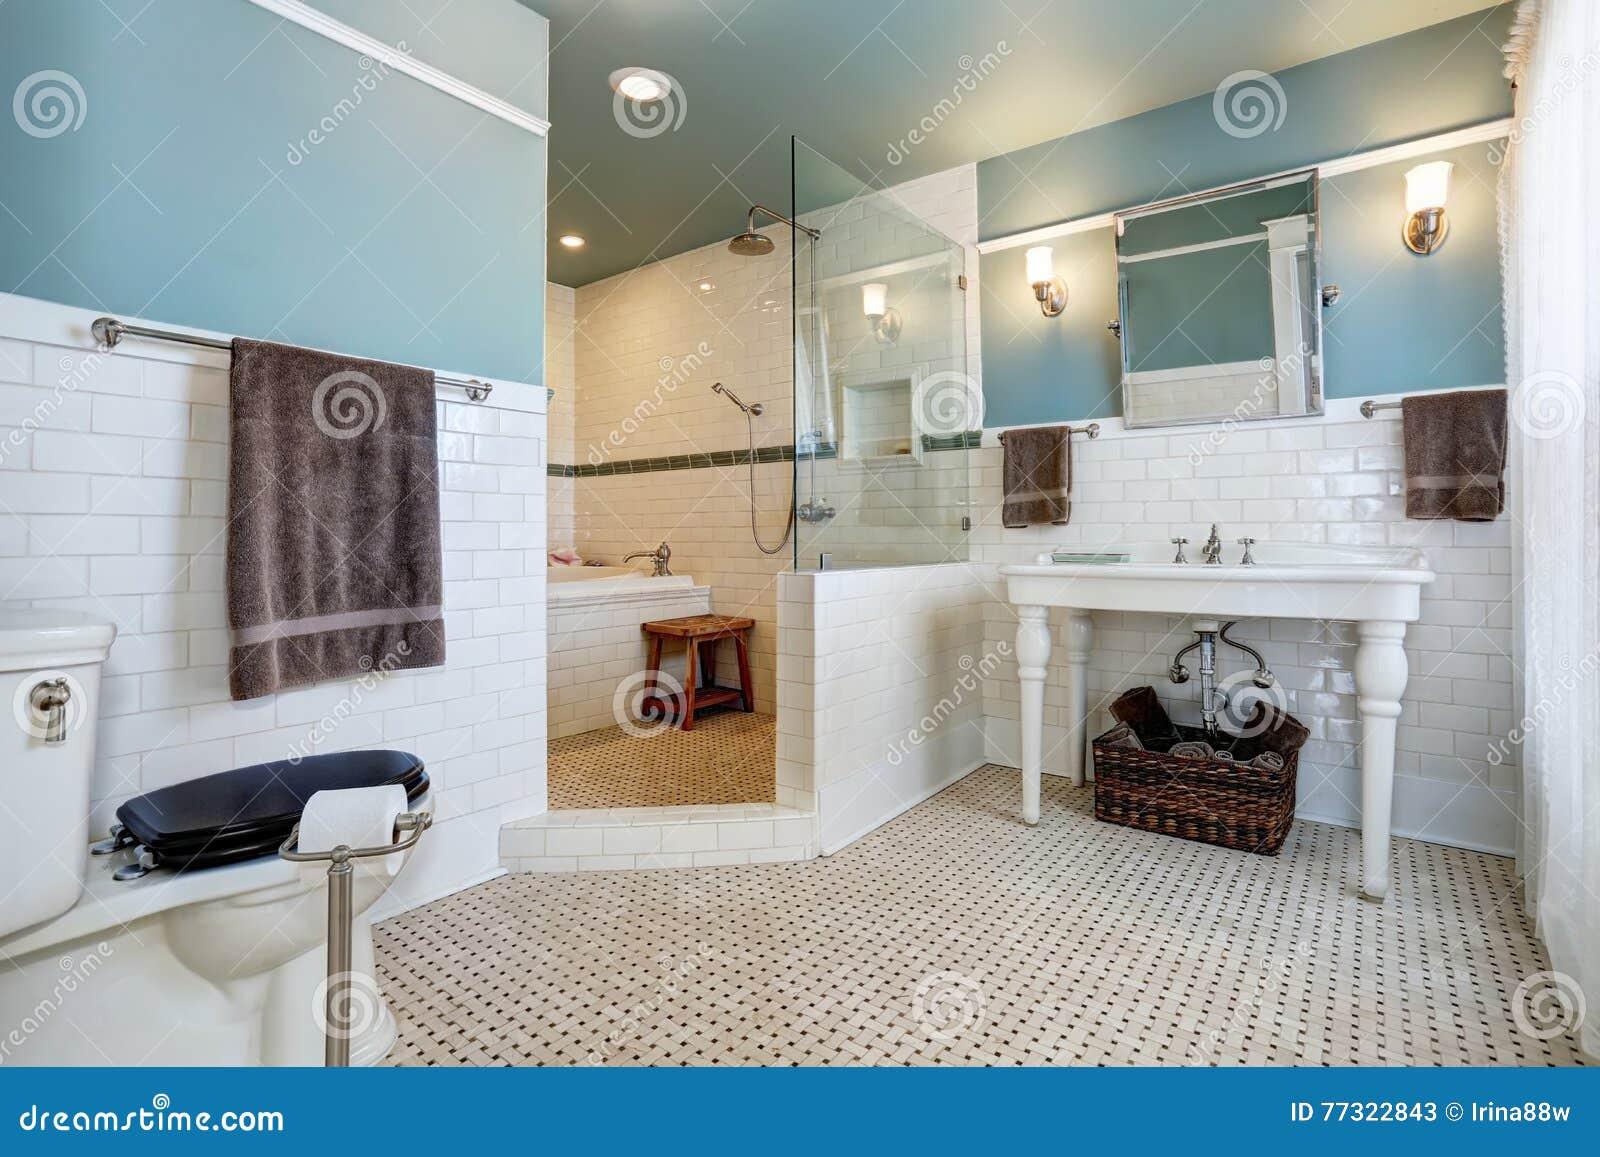 Blue Bathroom Interior With White Tile Trim Wall White